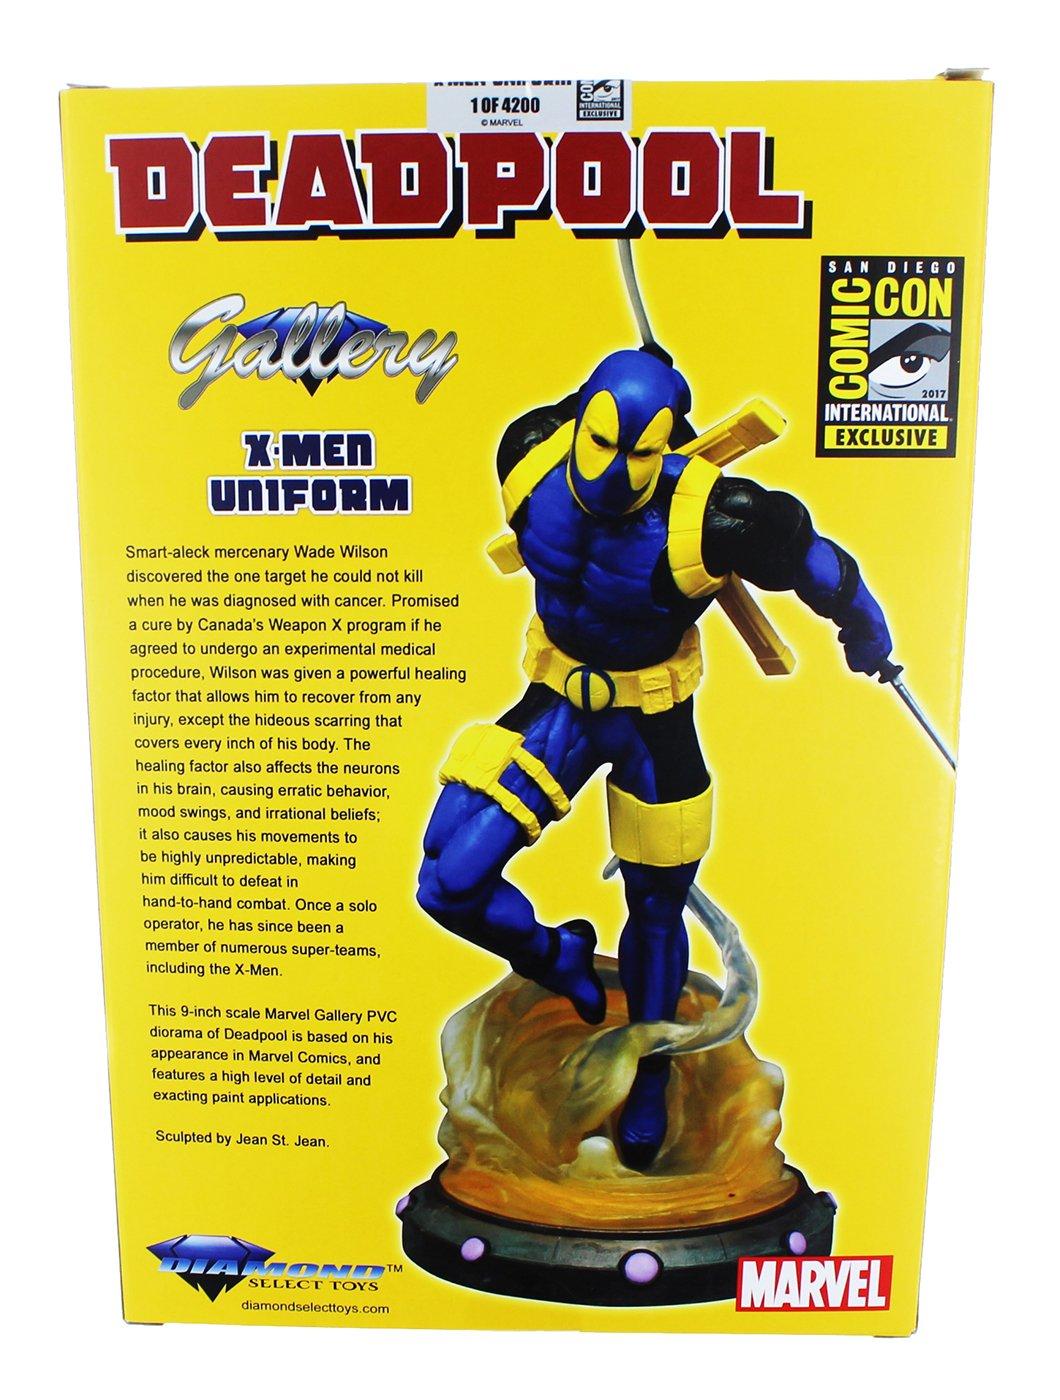 SDCC 2017 Exclusive PVC Figure Marvel Gallery 10 Deadpool X-Men Variant Diamond